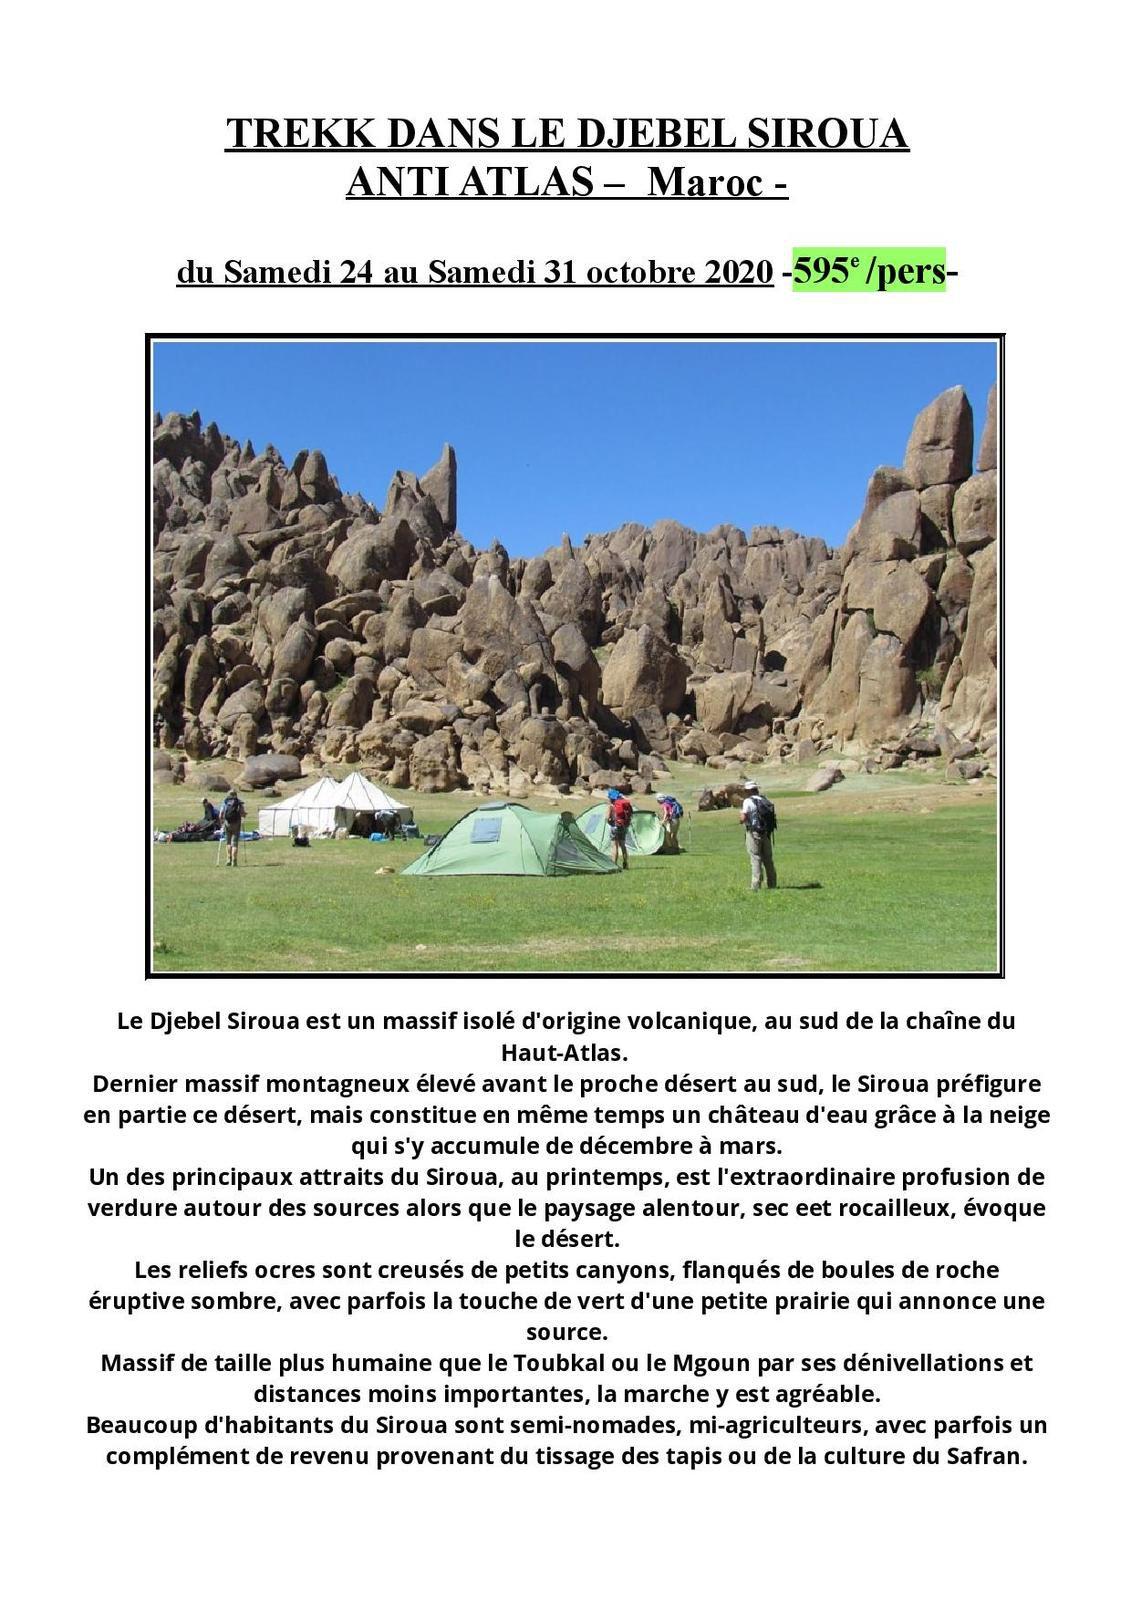 DJEBEL SIROUA - ANTI ATLAS MAROCAIN - du sam.24 au sam.31 octobre 2020 -